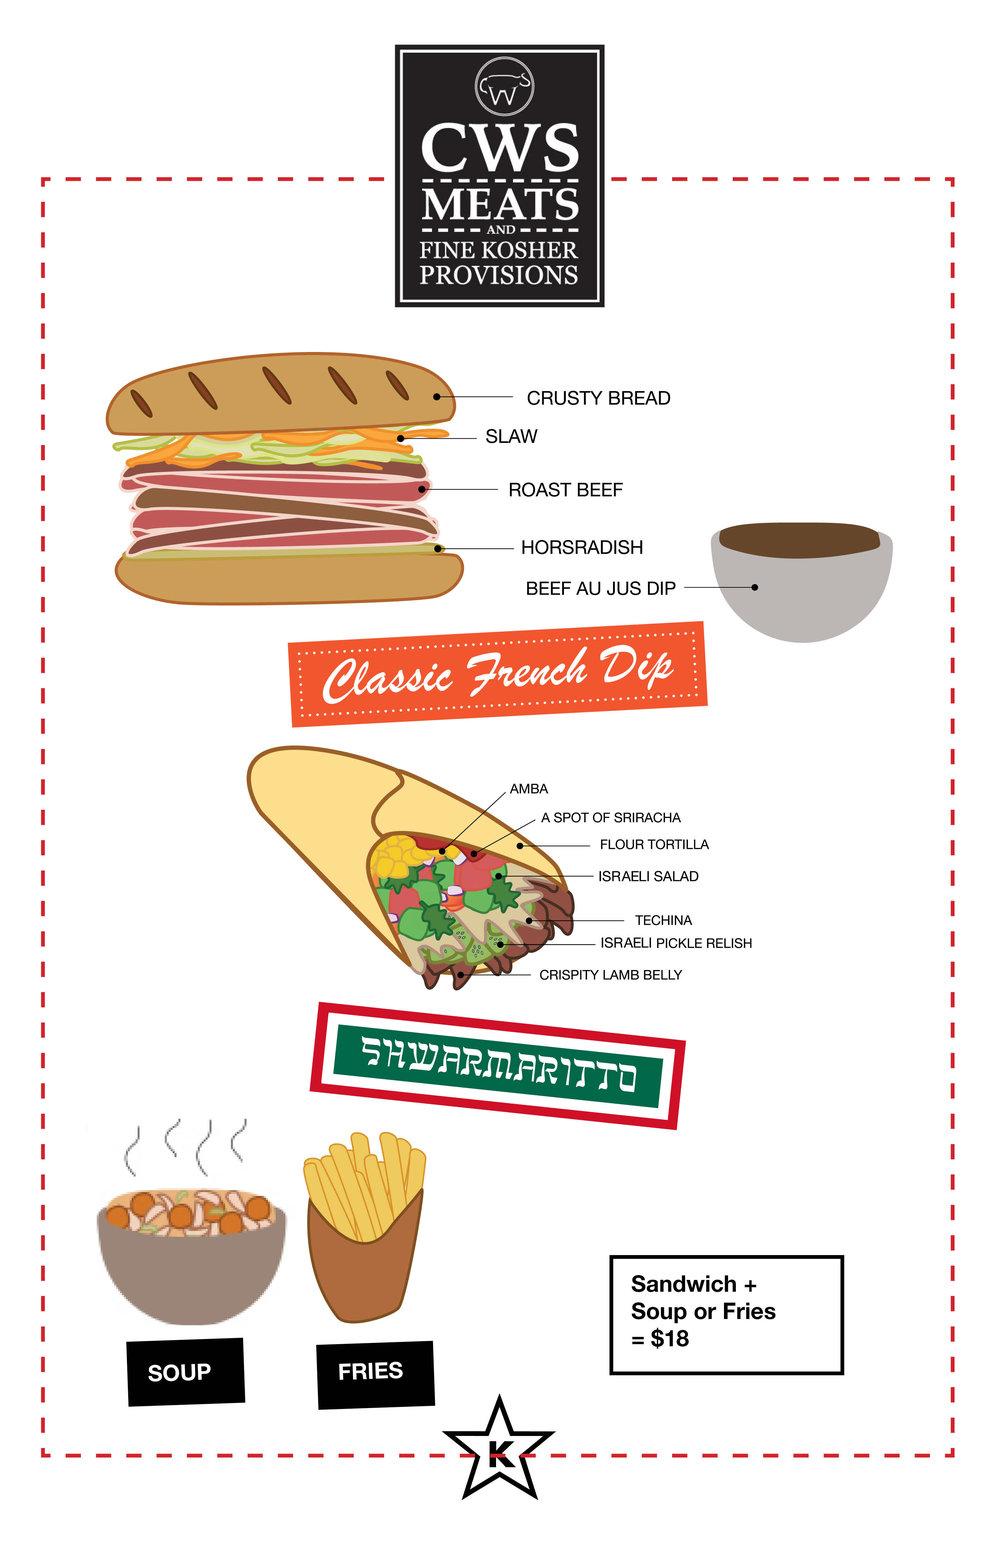 CWS menu 1/31